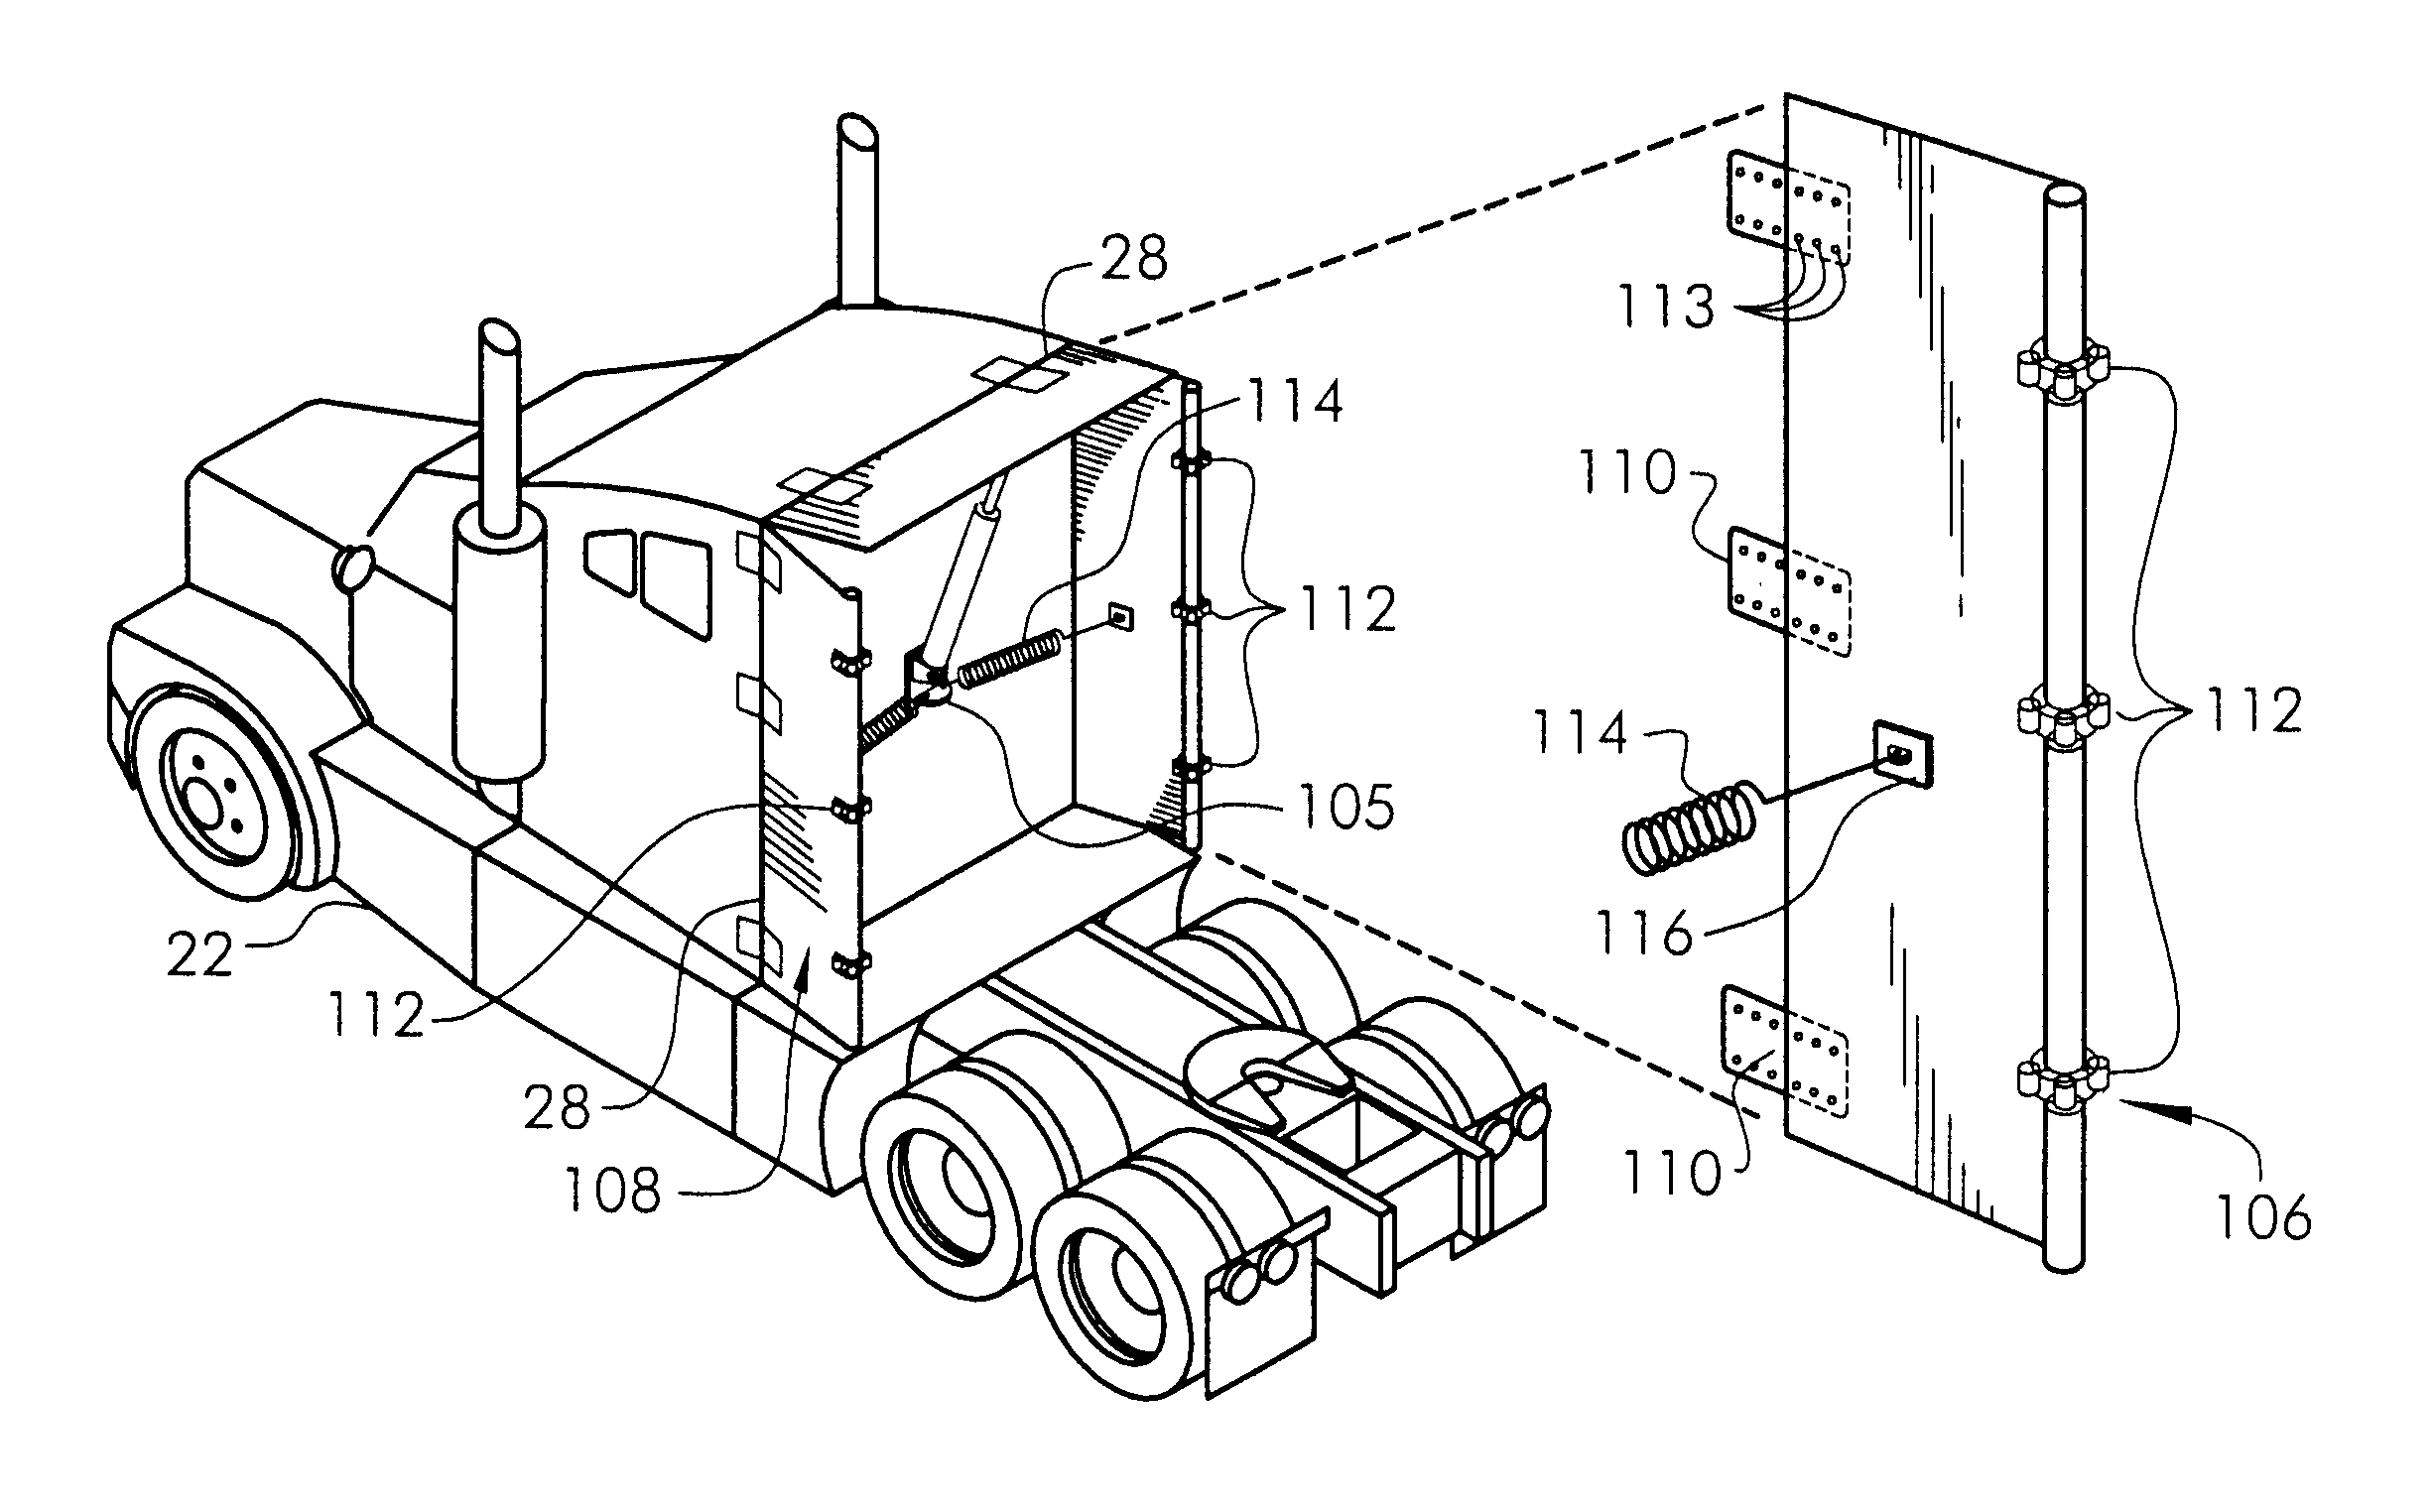 1995 gmc sierra trailer wiring diagram 1995 discover your wiring 1996 volvo semi truck wiring diagram 95 chevrolet